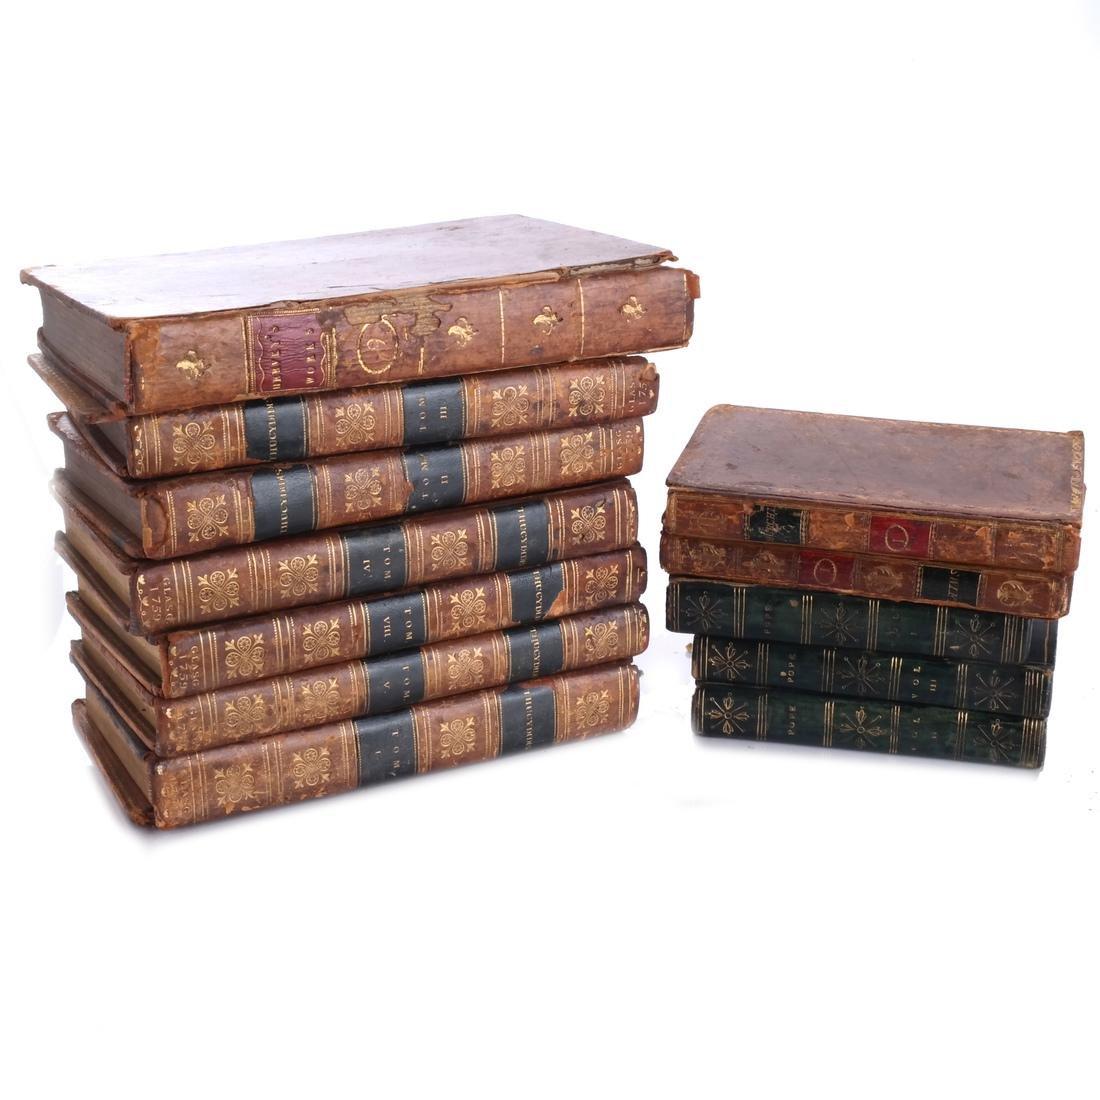 Books: 27+ Volumes - 3